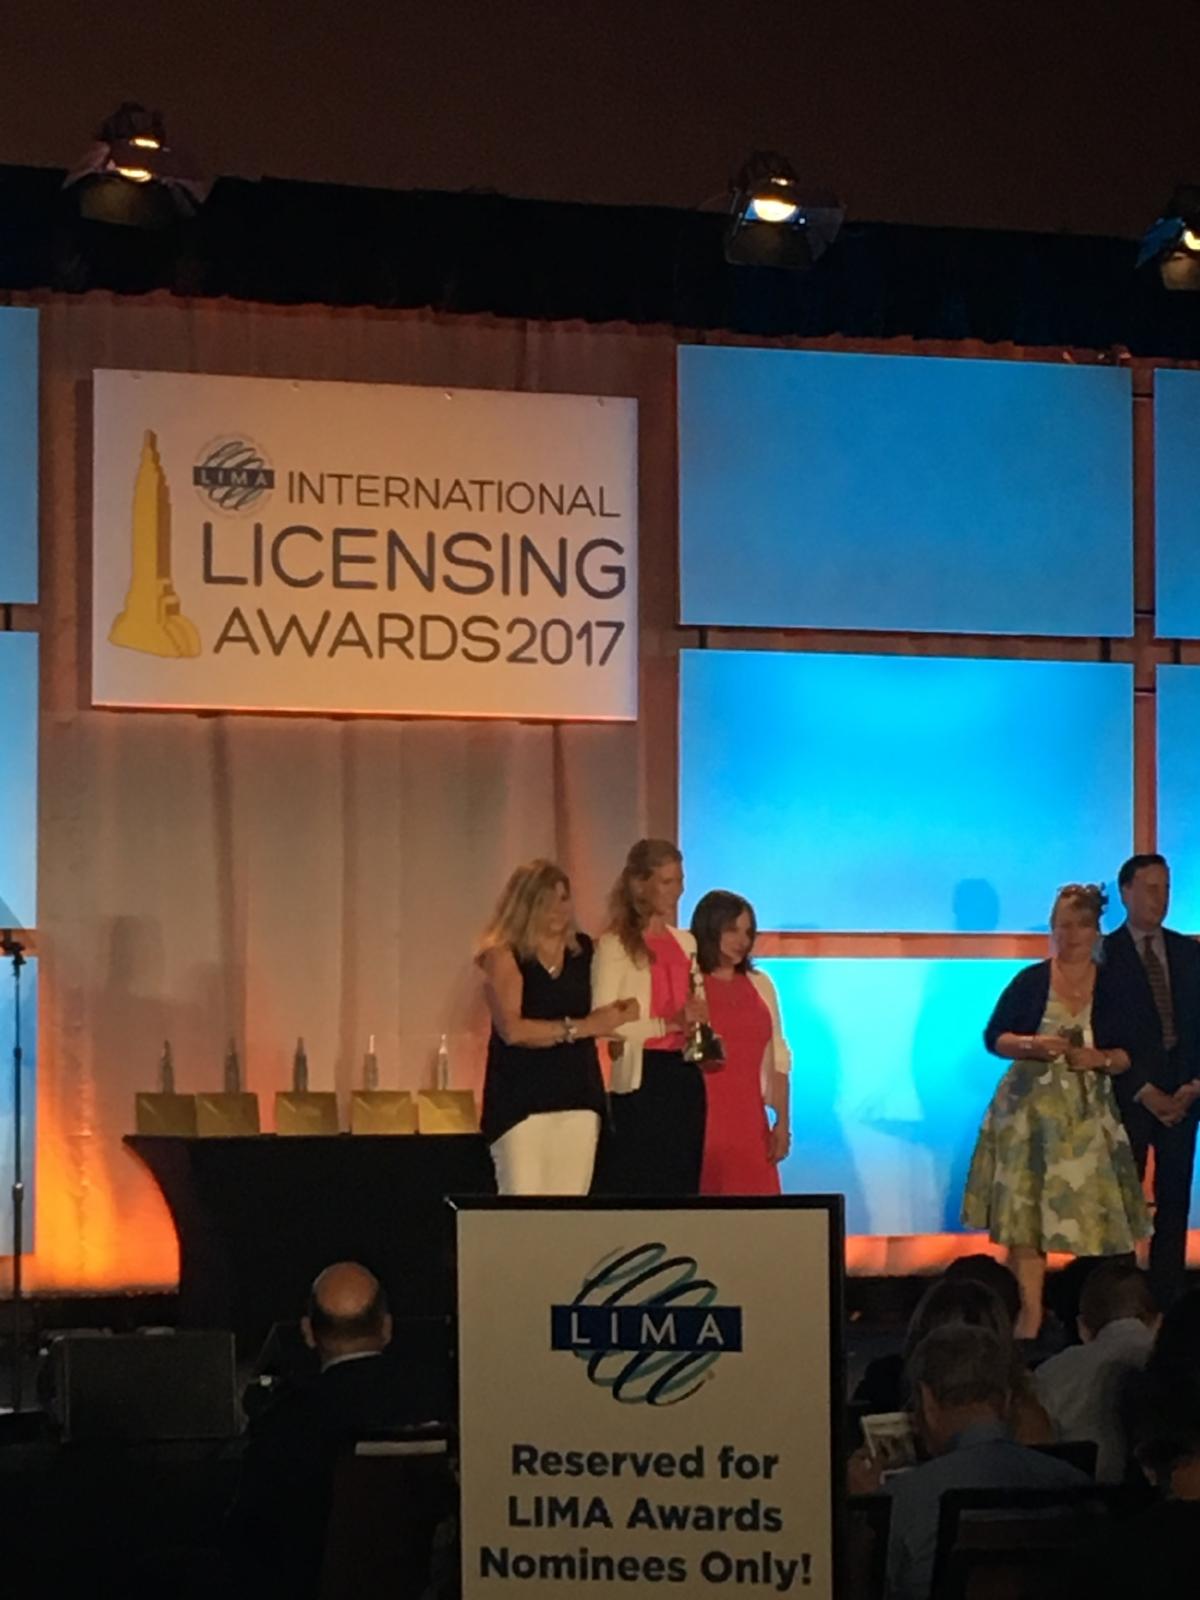 JLG LIMA Licensing Award Corona